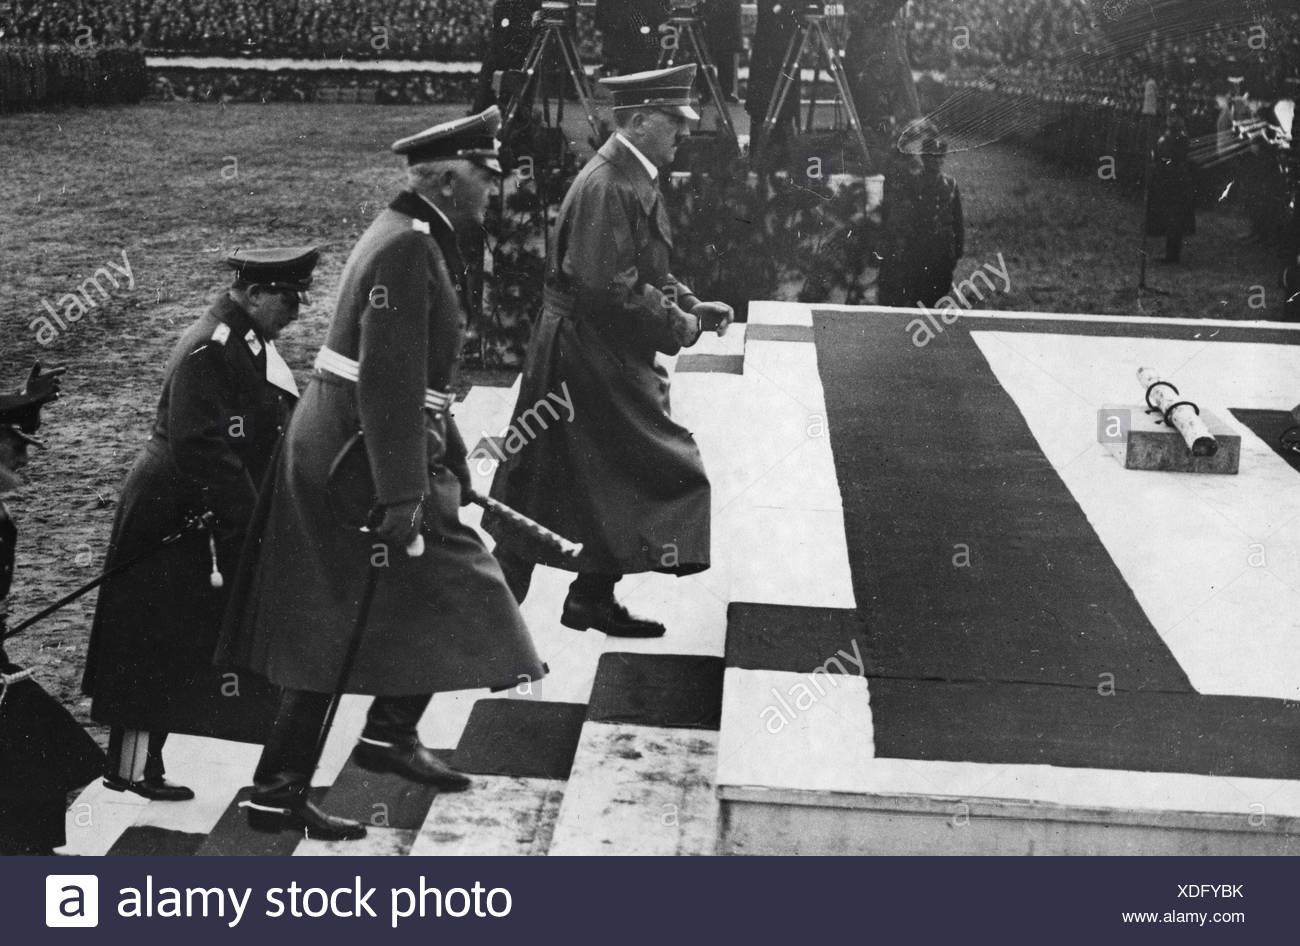 Hitler, Adolf, 20.4.1889 - 30.4.1945, German politician (NSDAP), chancellor 30.1.1933 - 30.4.1945, at the laying of the foundati Stockbild